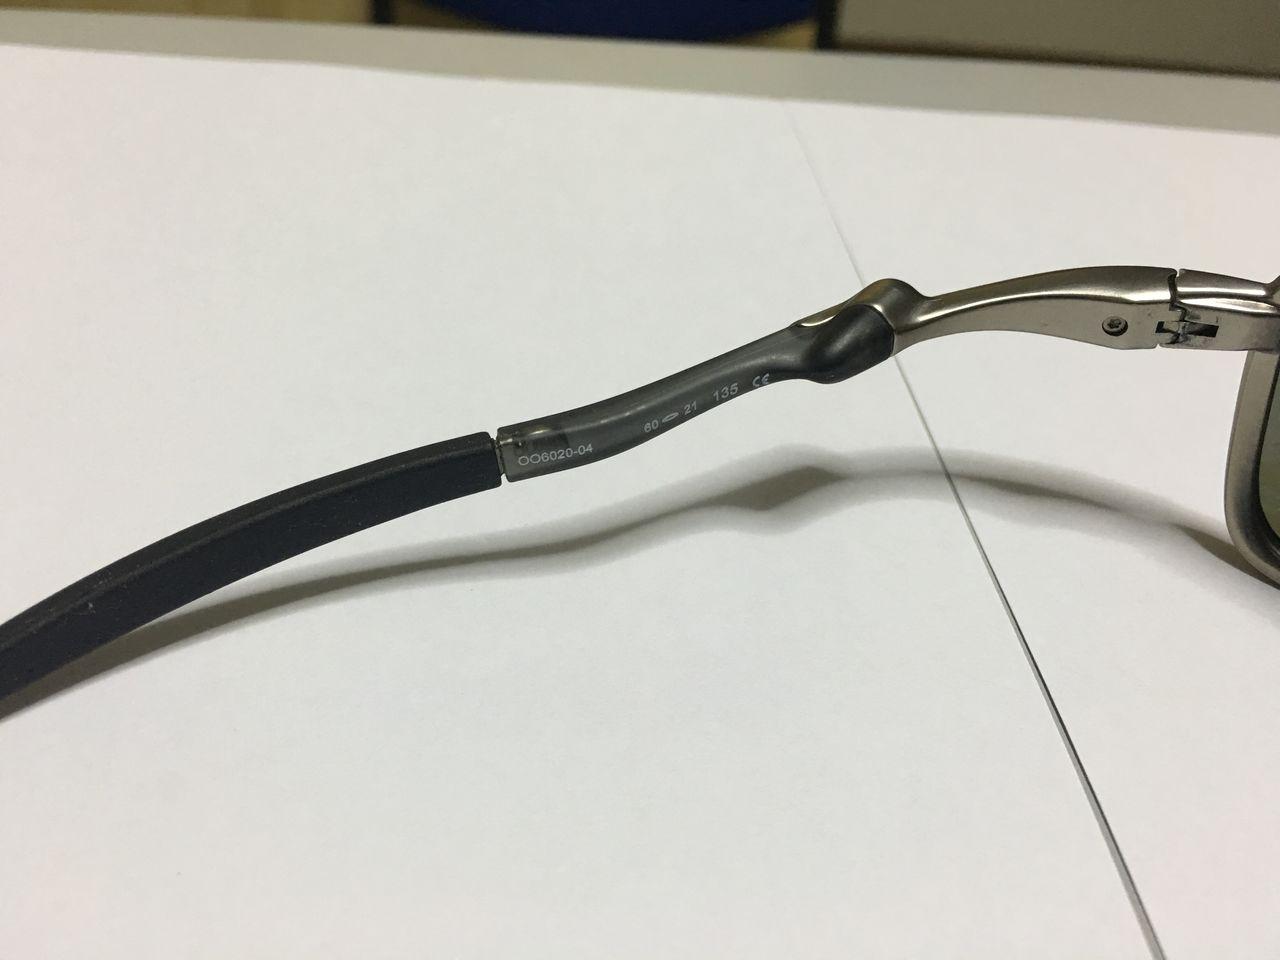 FS: Xsquared, Carbon frame OOBIP sku oo6011-08, Badman Plasma frame with Sapphire lenses - IMG_1387.jpg